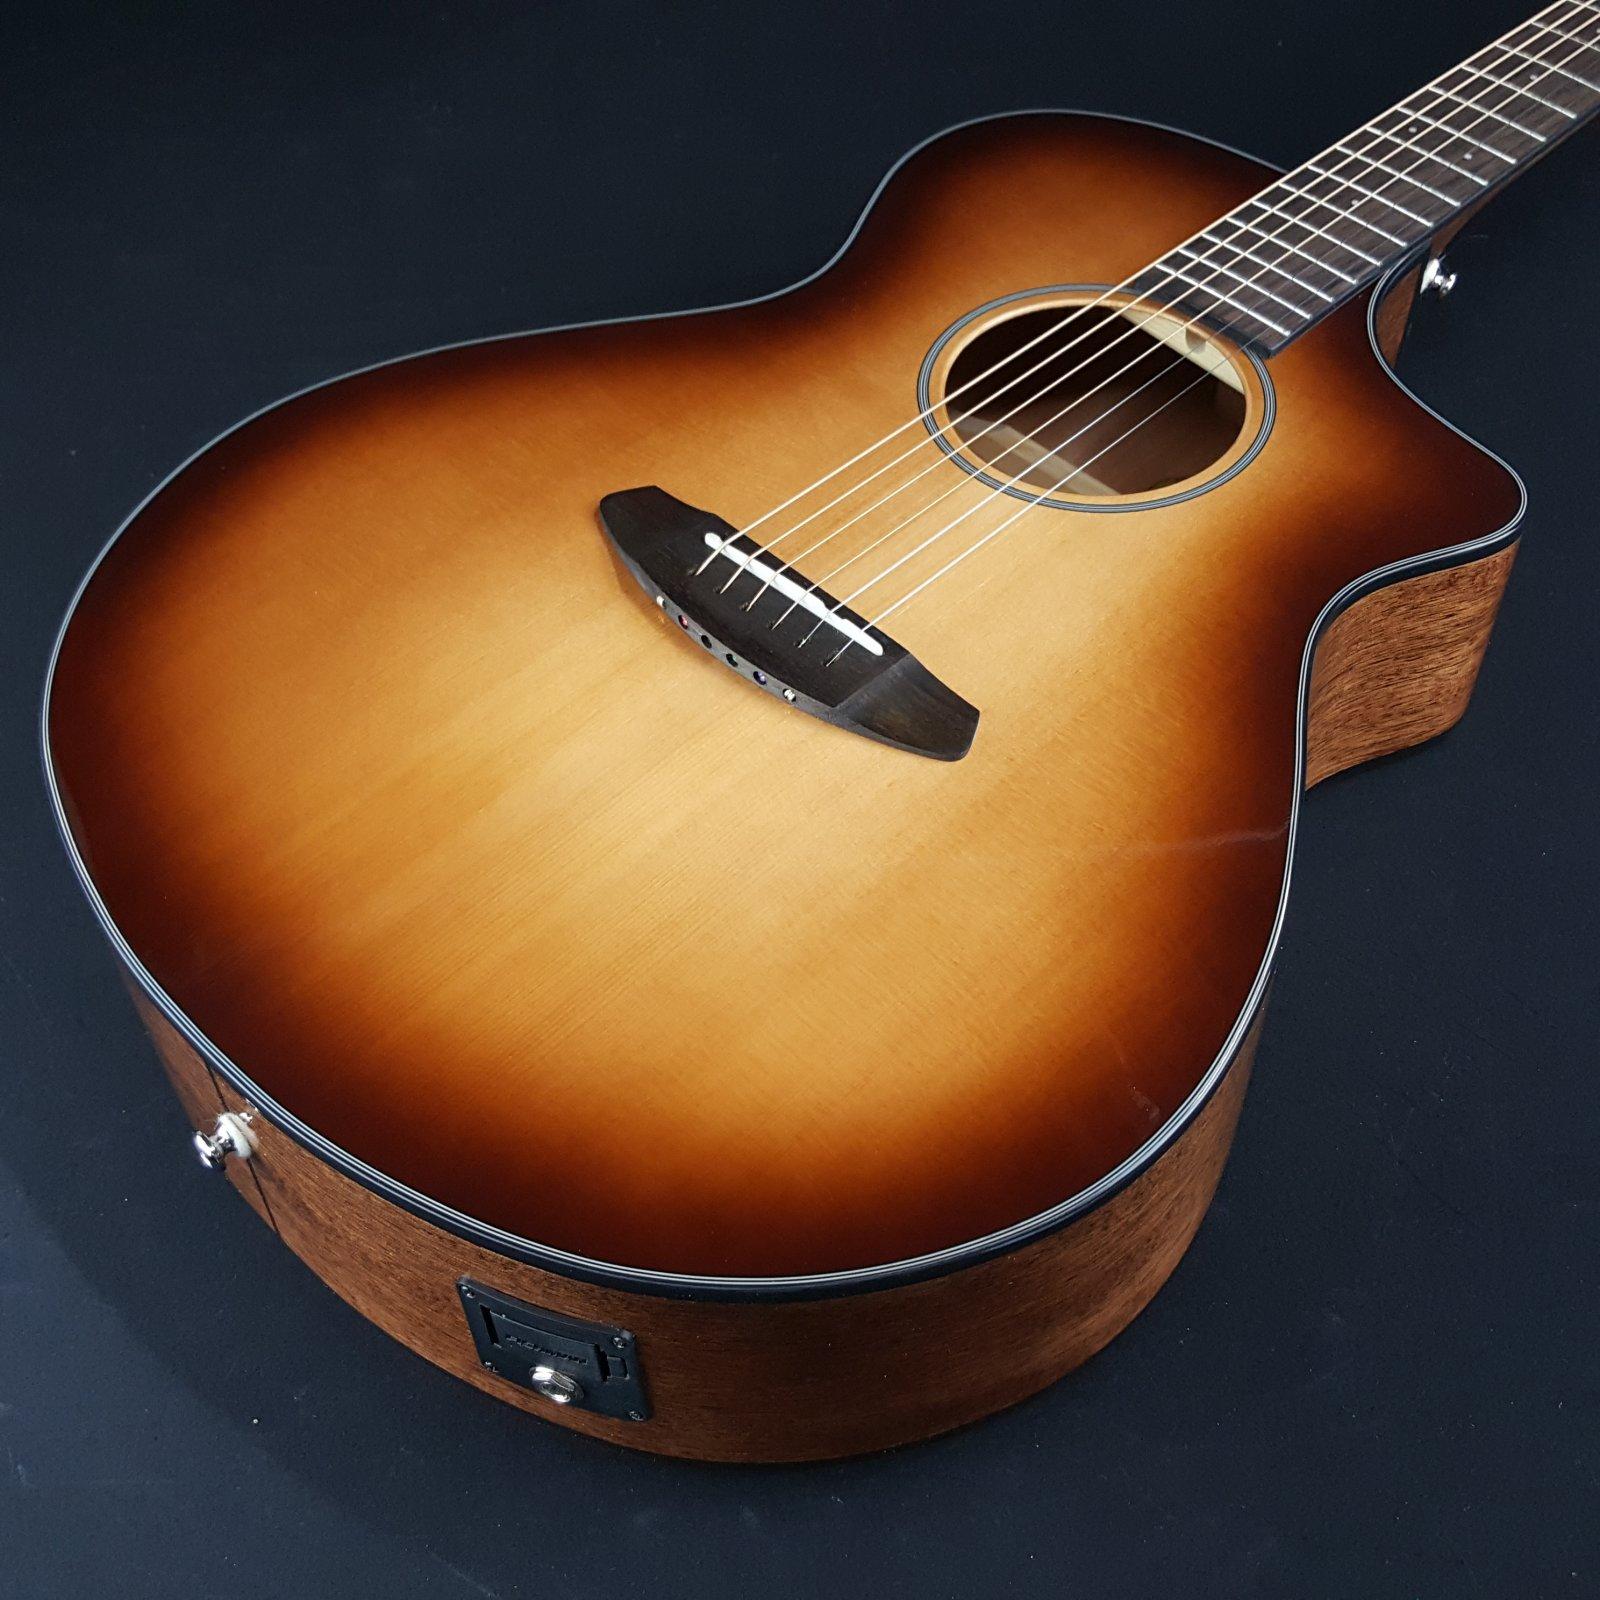 Breedlove Discovery Concert CE Electric Acoustic Guitar Sunburst